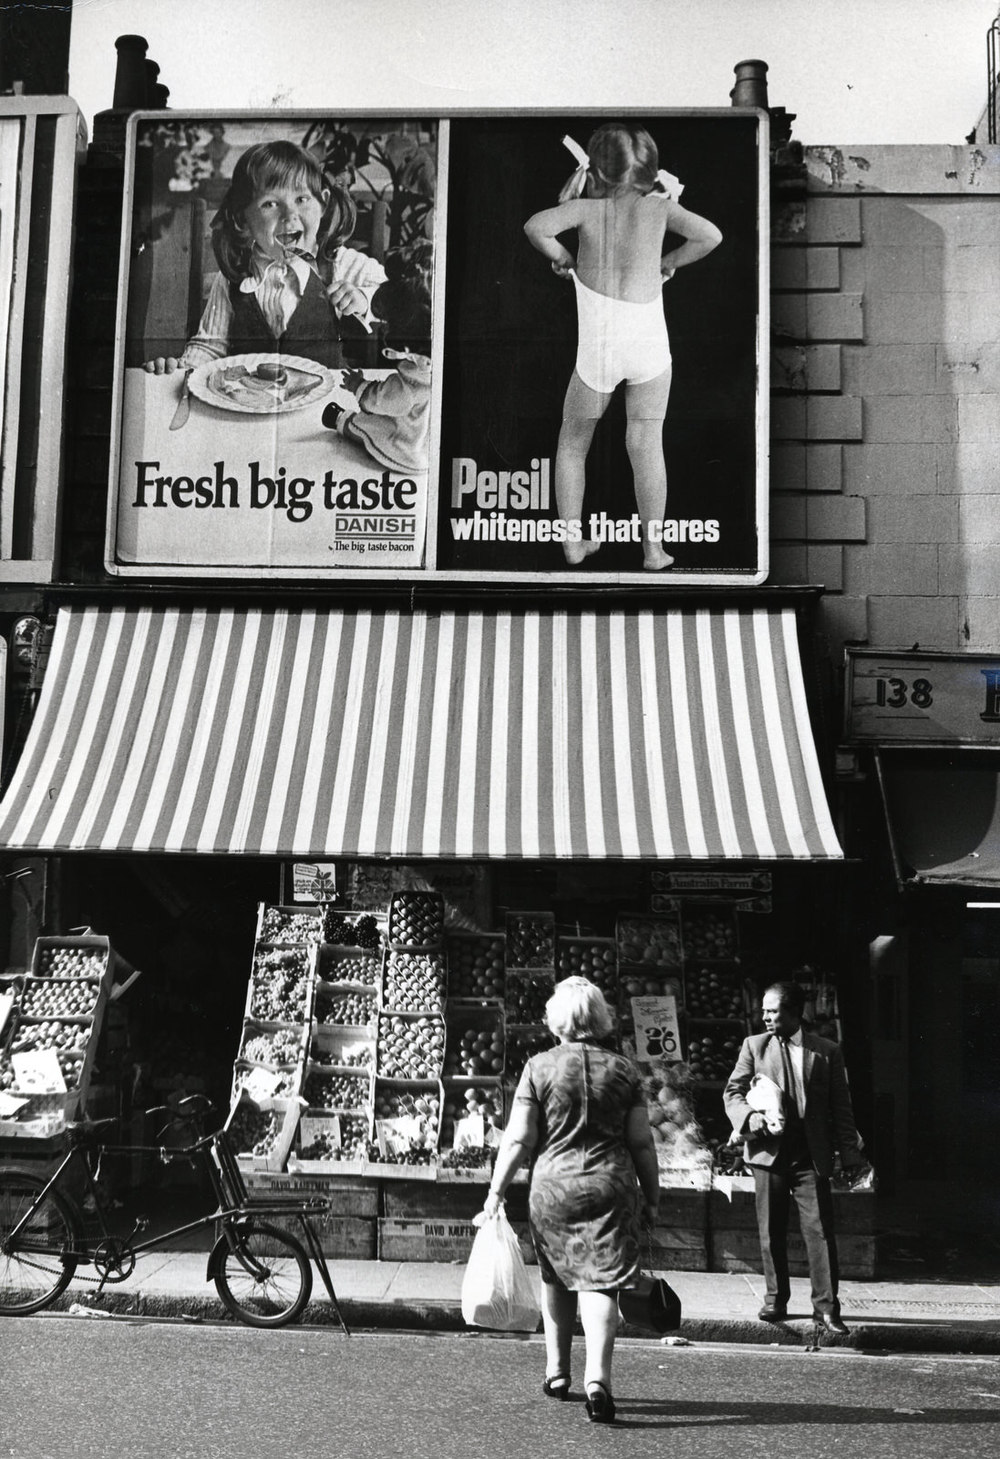 Paddington, London, England, 1960's ©Dorothy Bohm